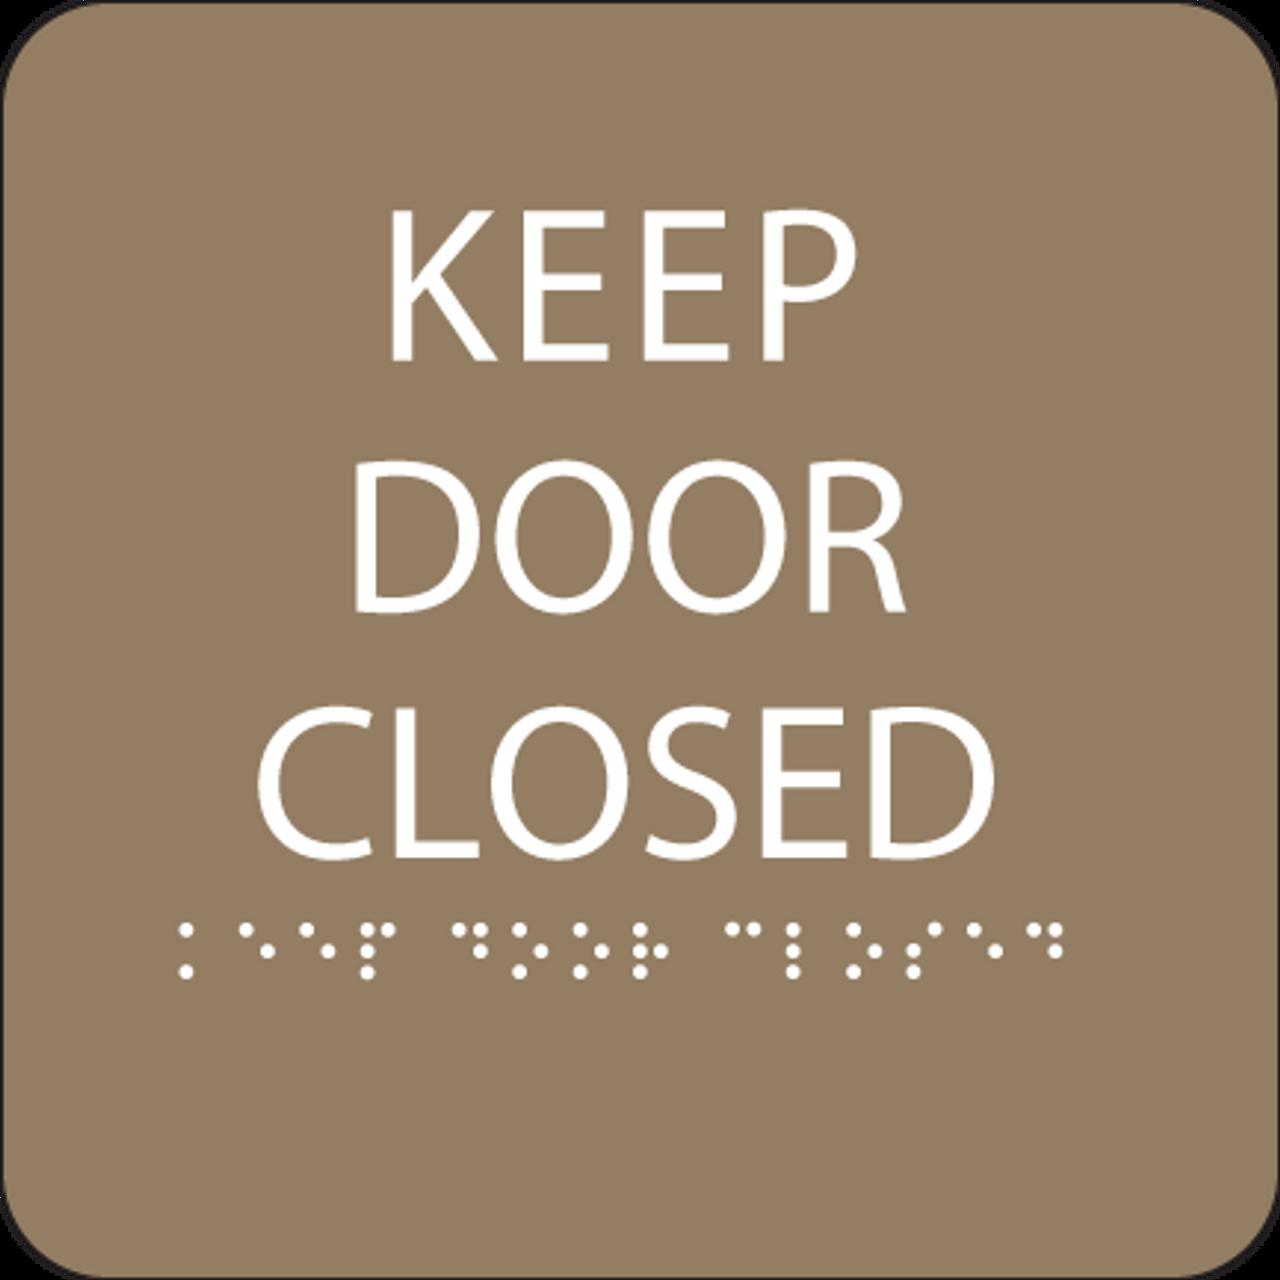 Brown Keep Door Closed Braille Sign